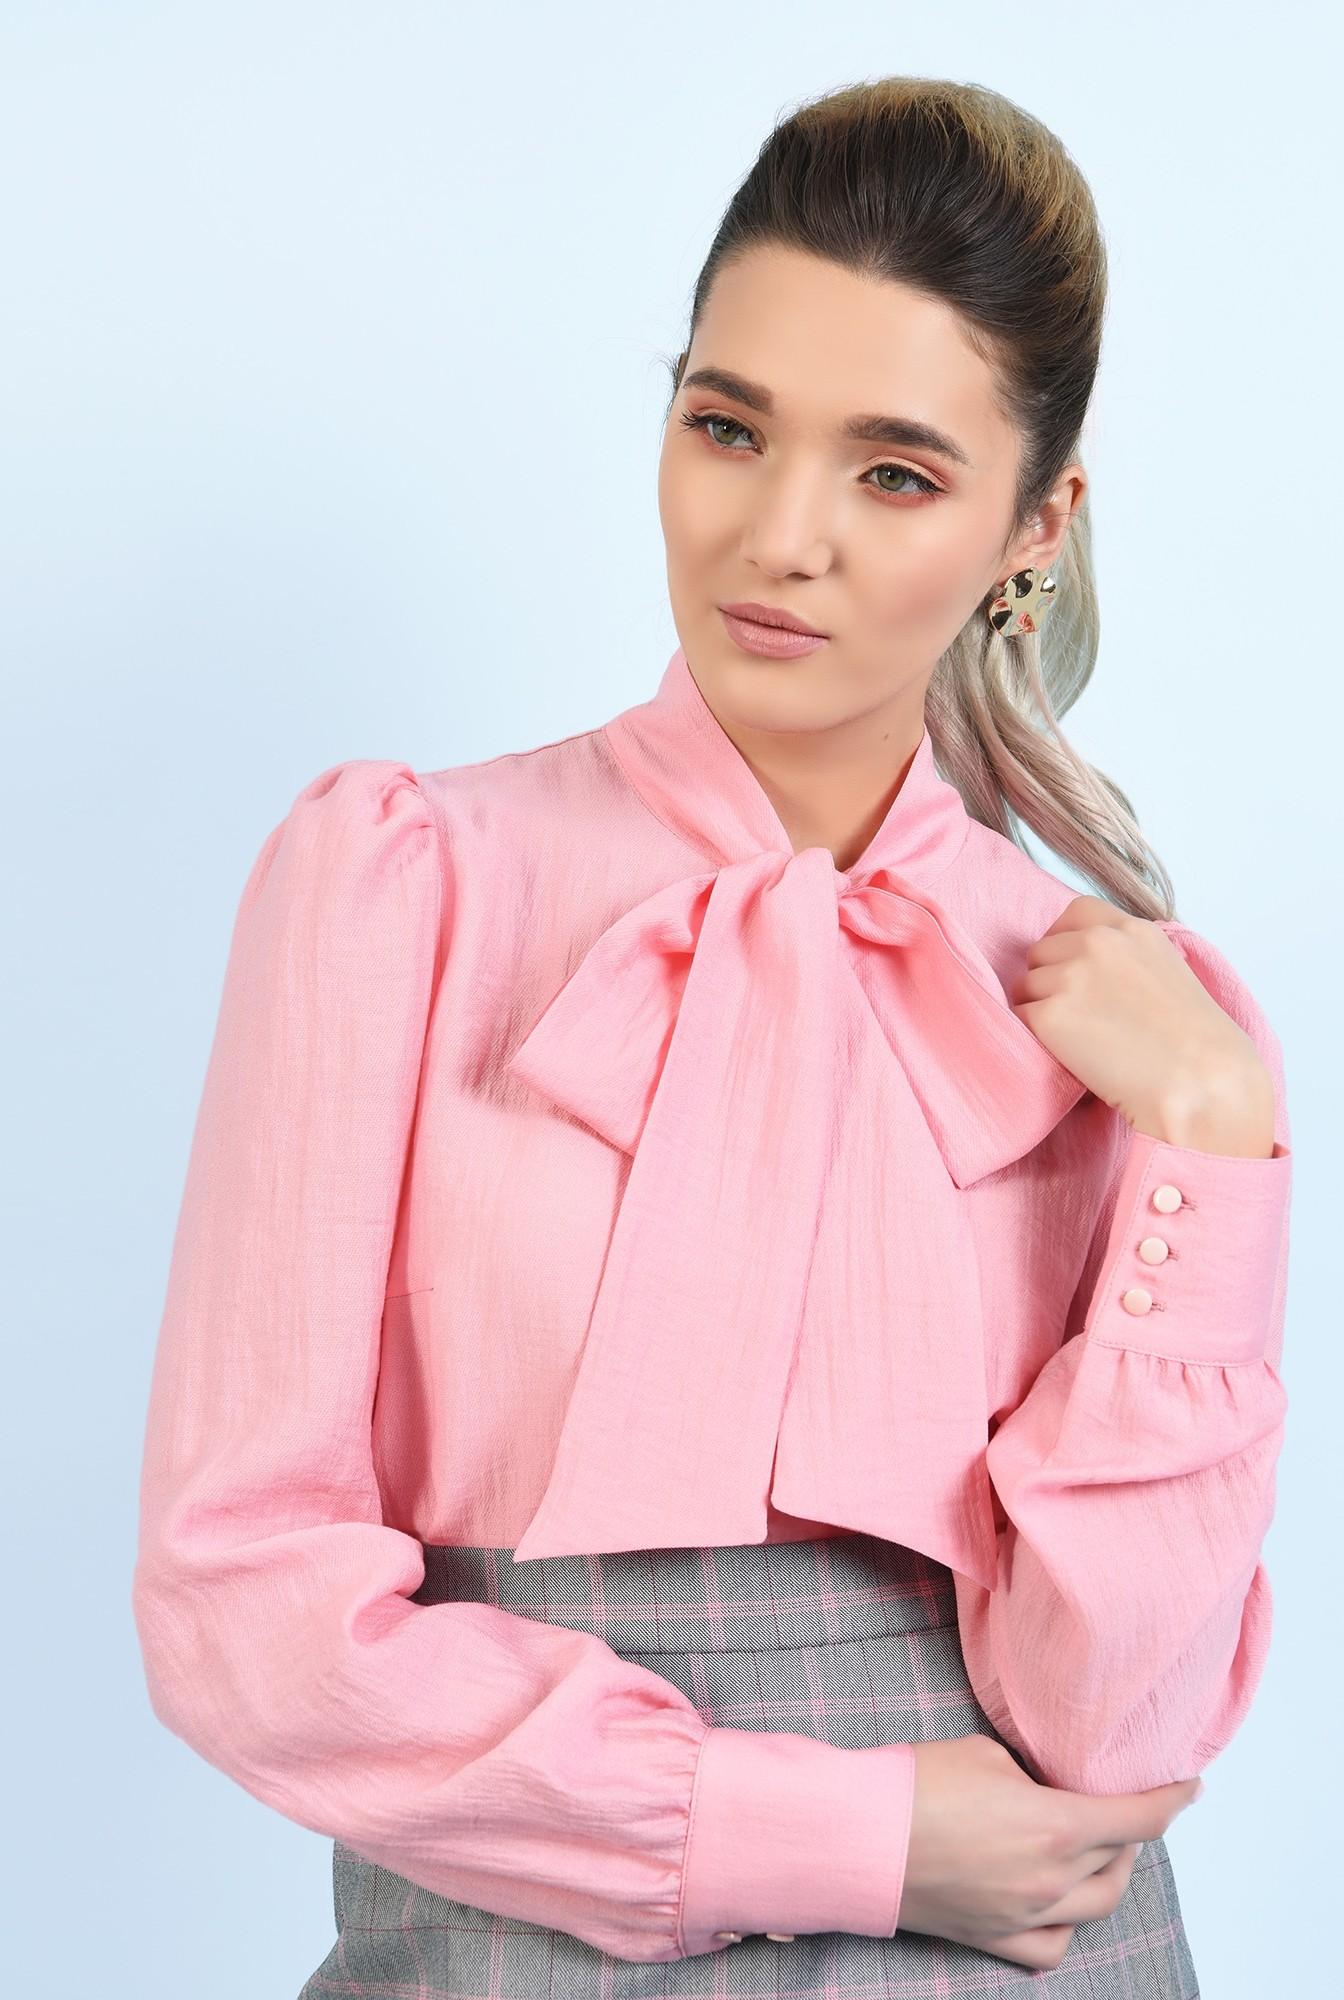 2 - bluza casual, roz, cu funda, maneci lungi, Poema